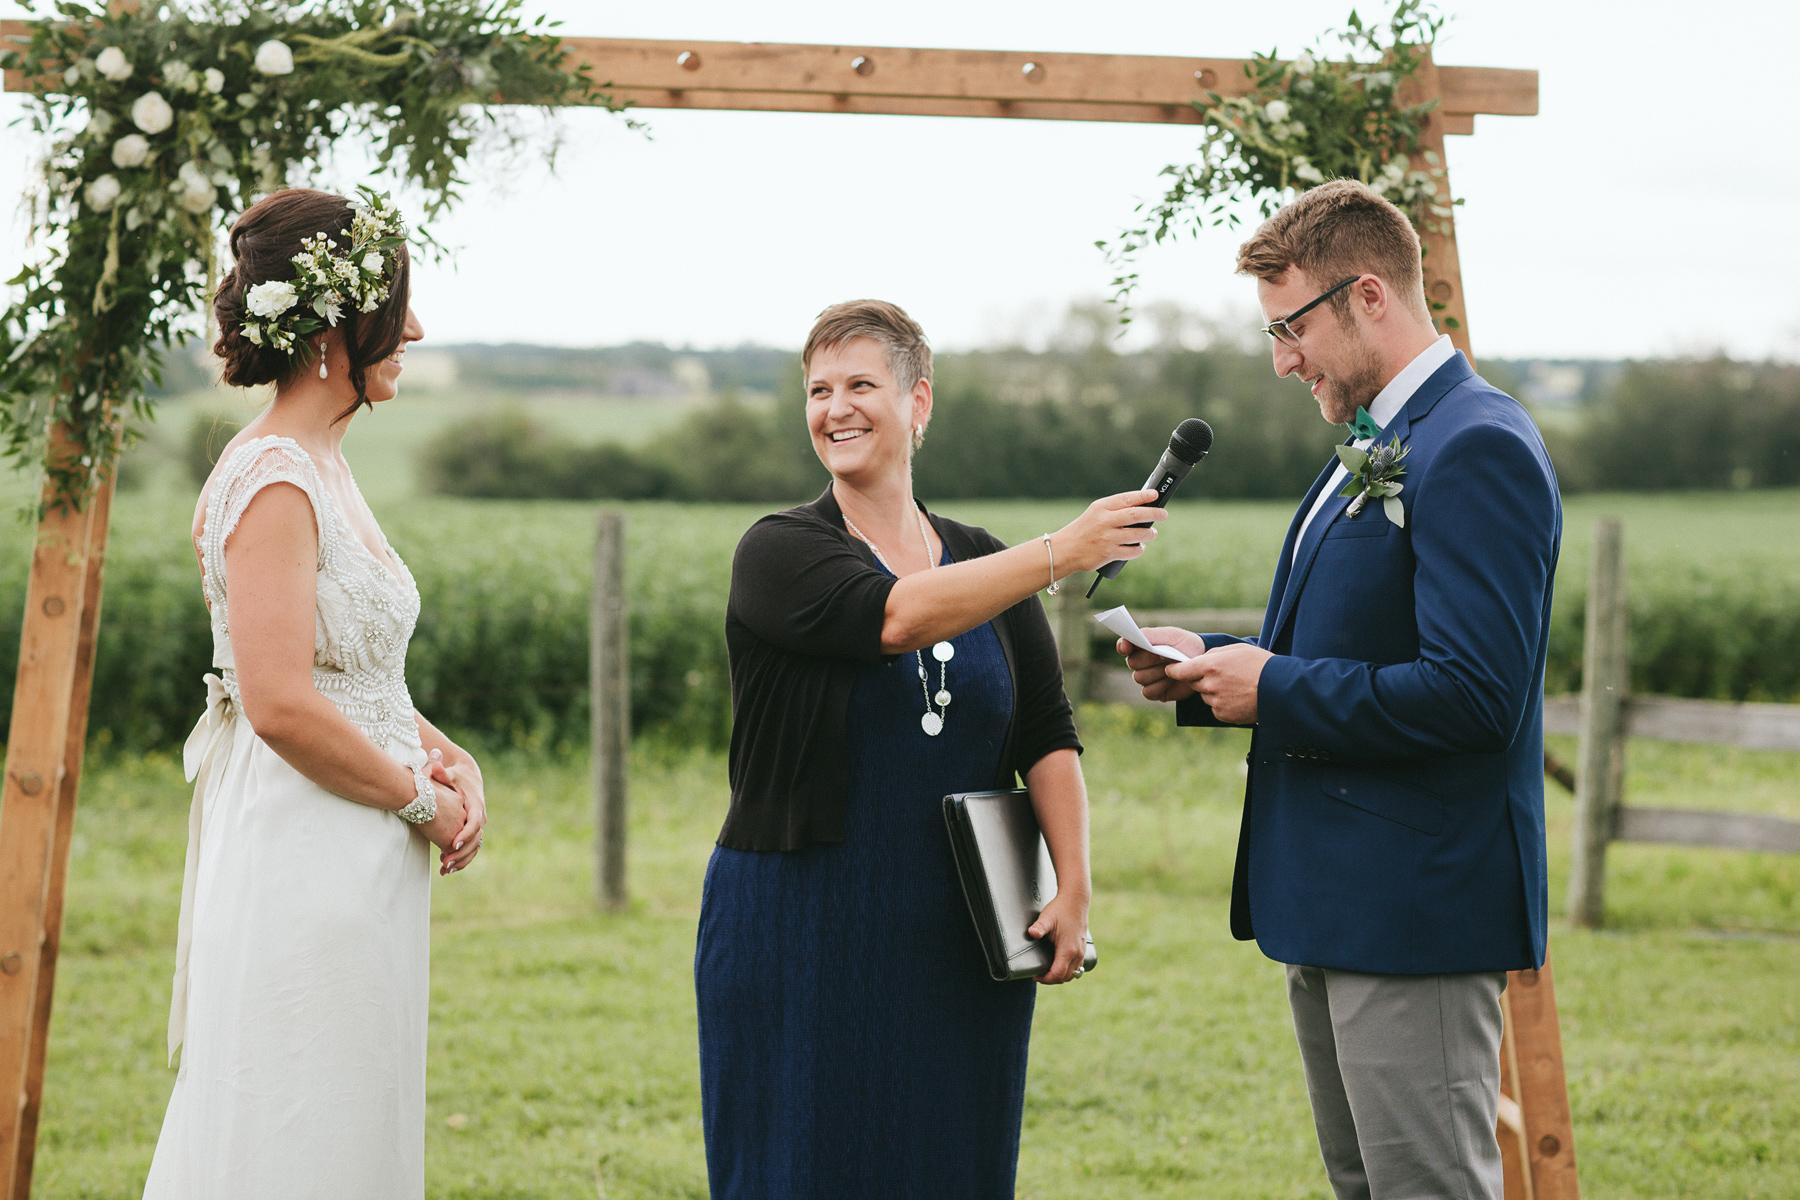 alberta-farm-wedding-photographer-rp-wj-117.jpg